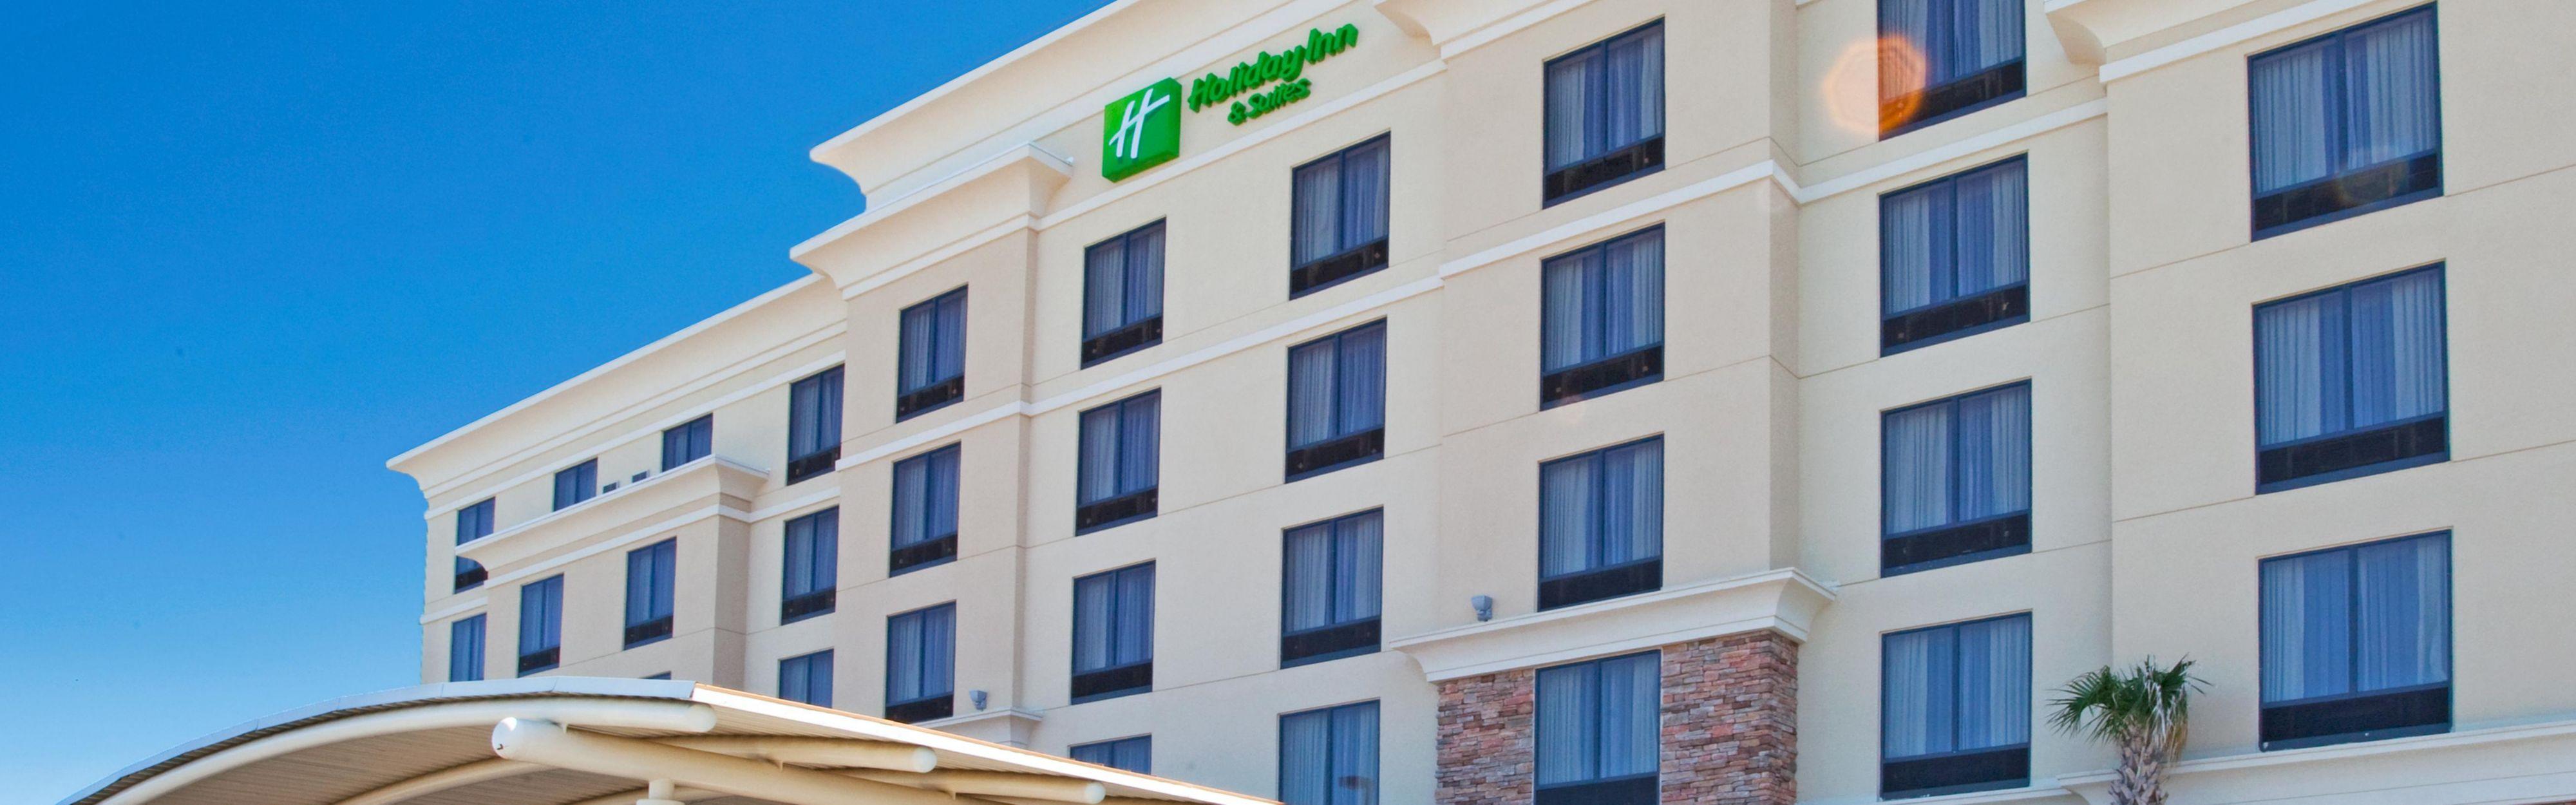 Hotel Indigo Pittsburgh East Liberty - TripAdvisor